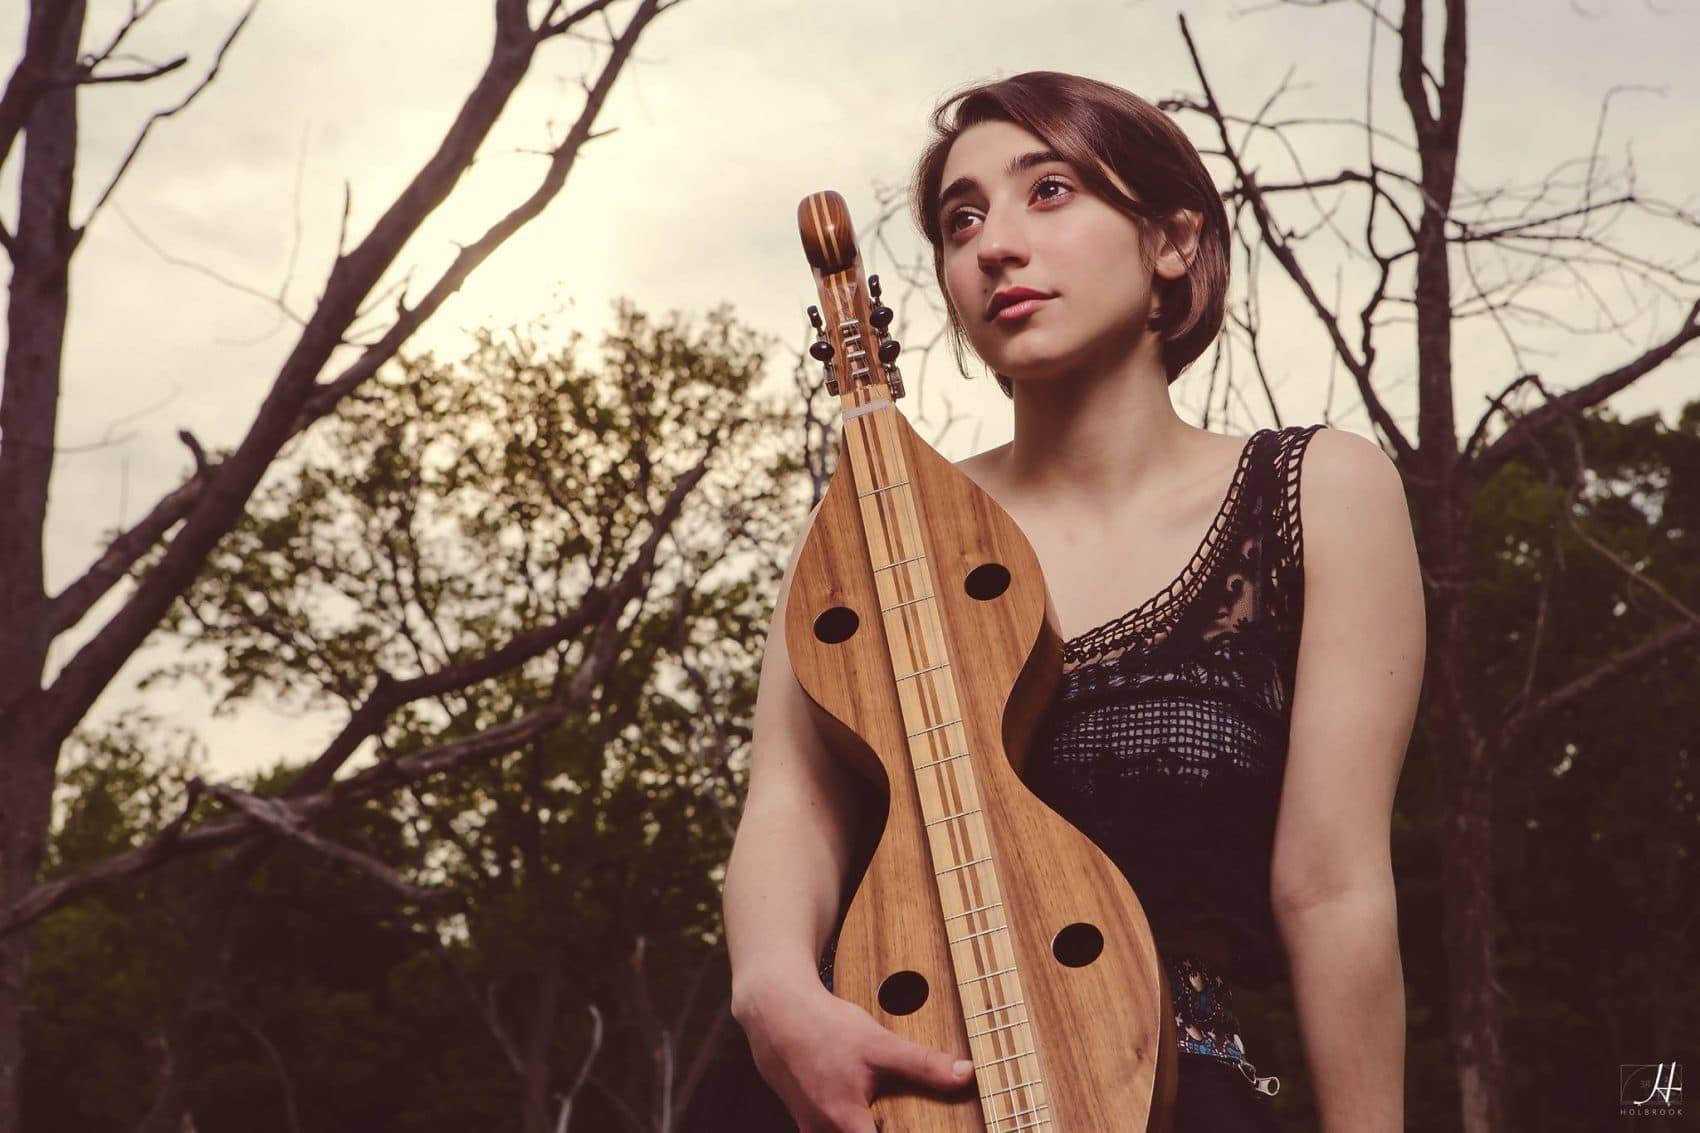 Musician Noelle Micarelli. (Courtesy Holbrook Gracia)